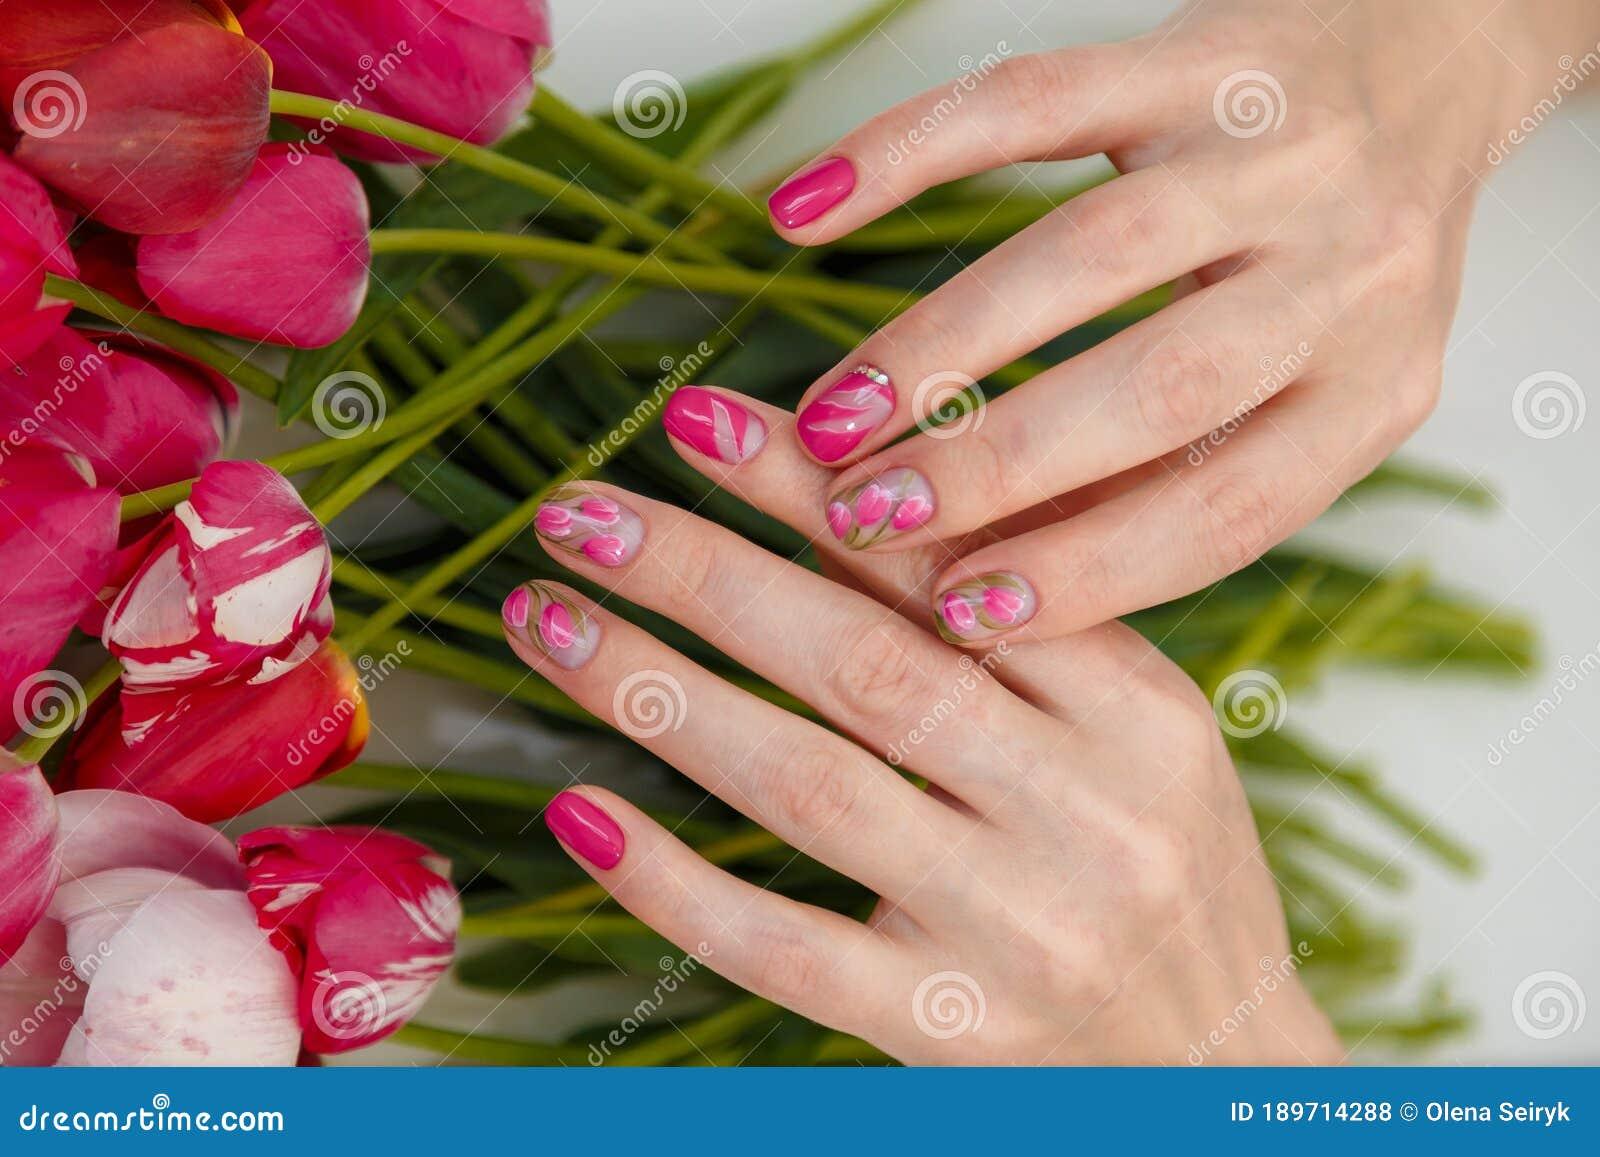 tulips design nail art manicured fingernails spring flowers background beauty concept tulips design nail art manicured 189714288